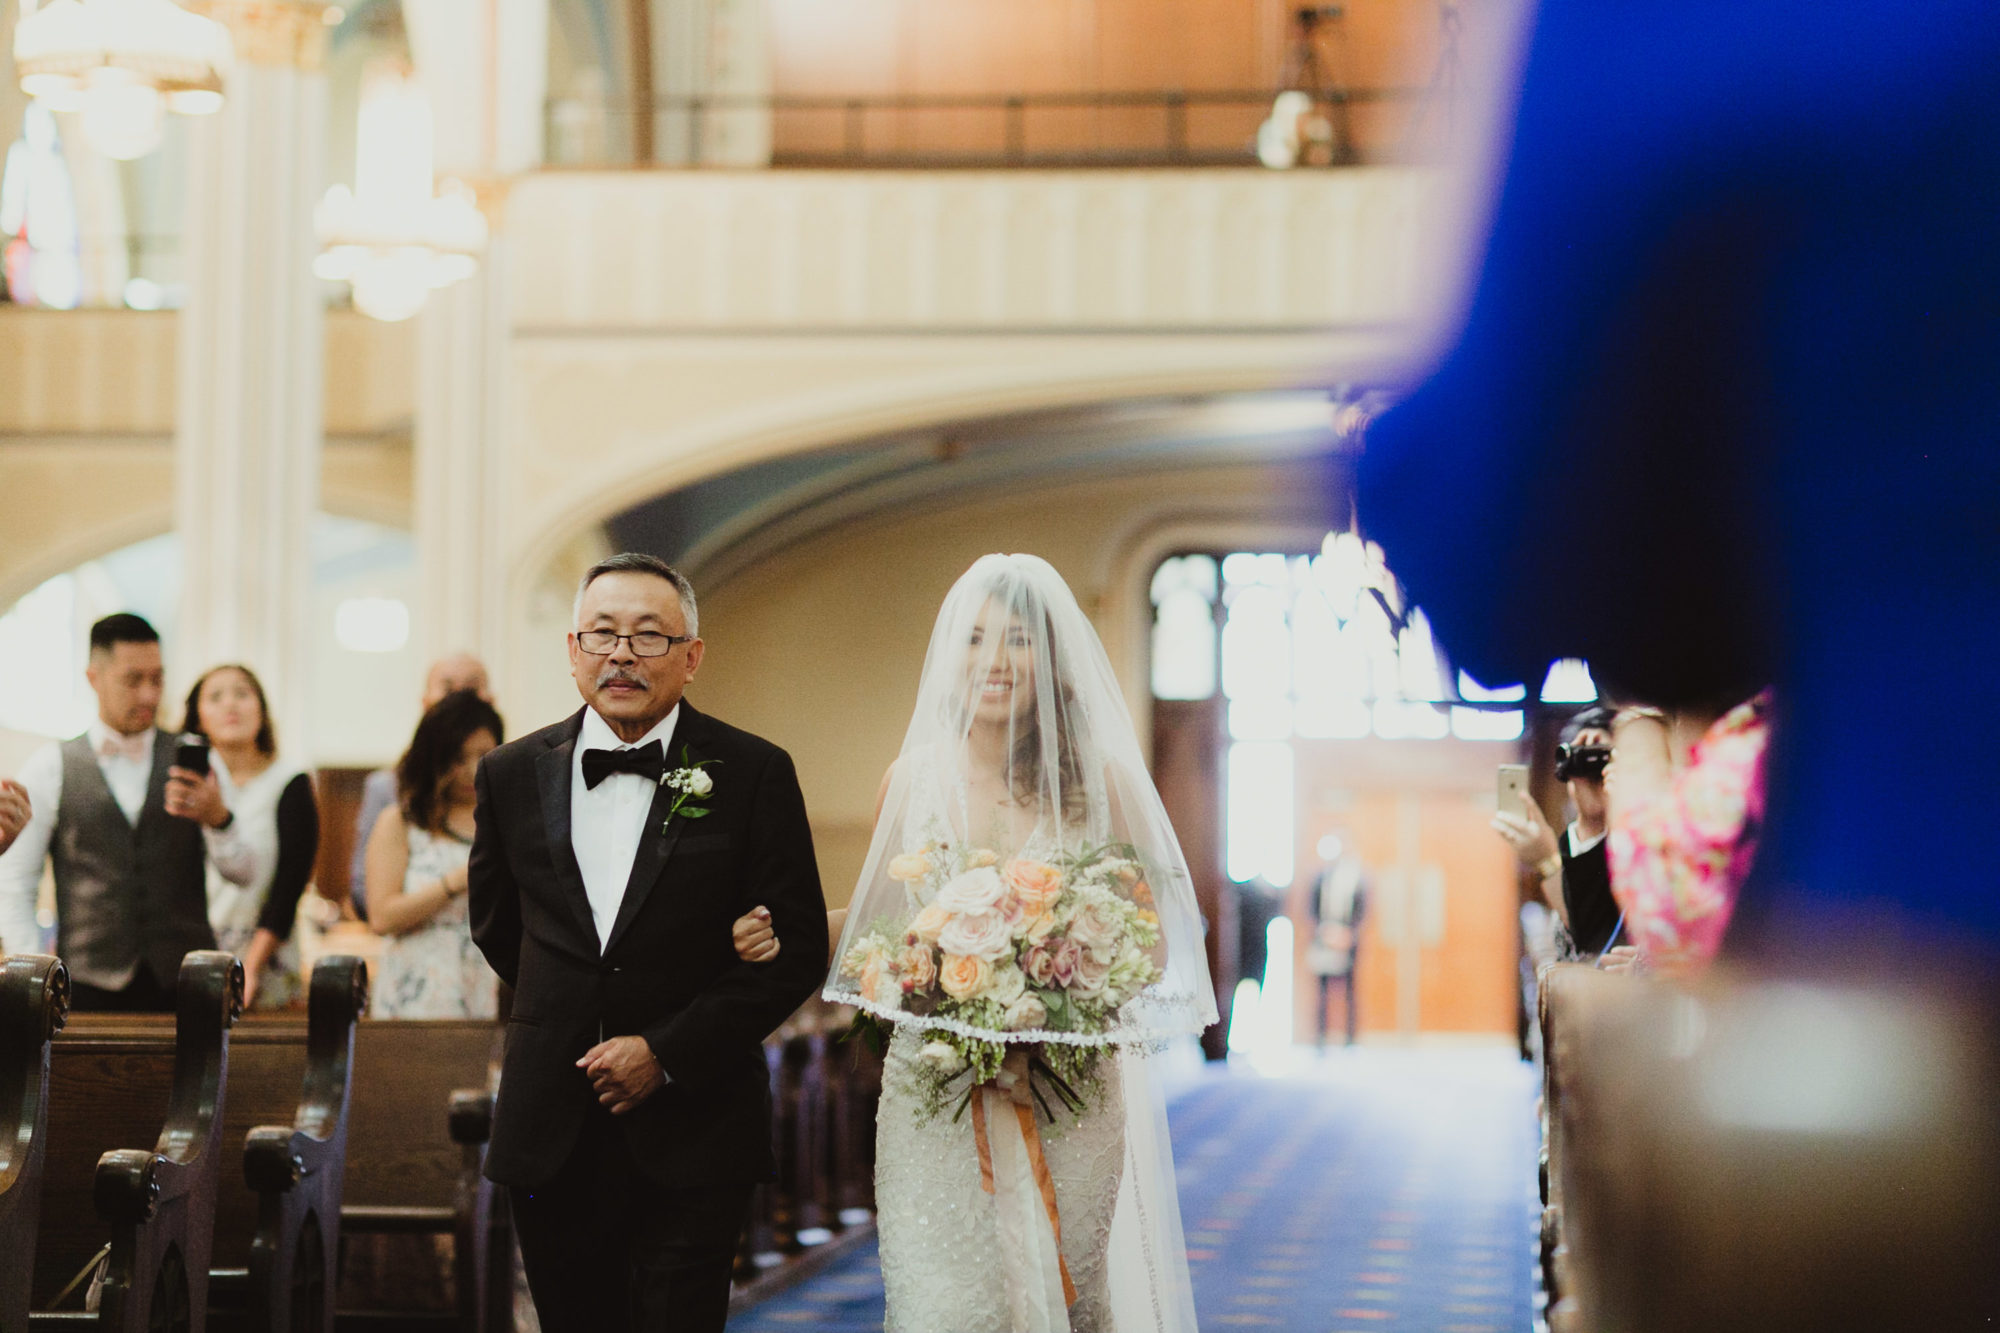 kansas-city-wedding-photographer-46-2000x1333.jpg